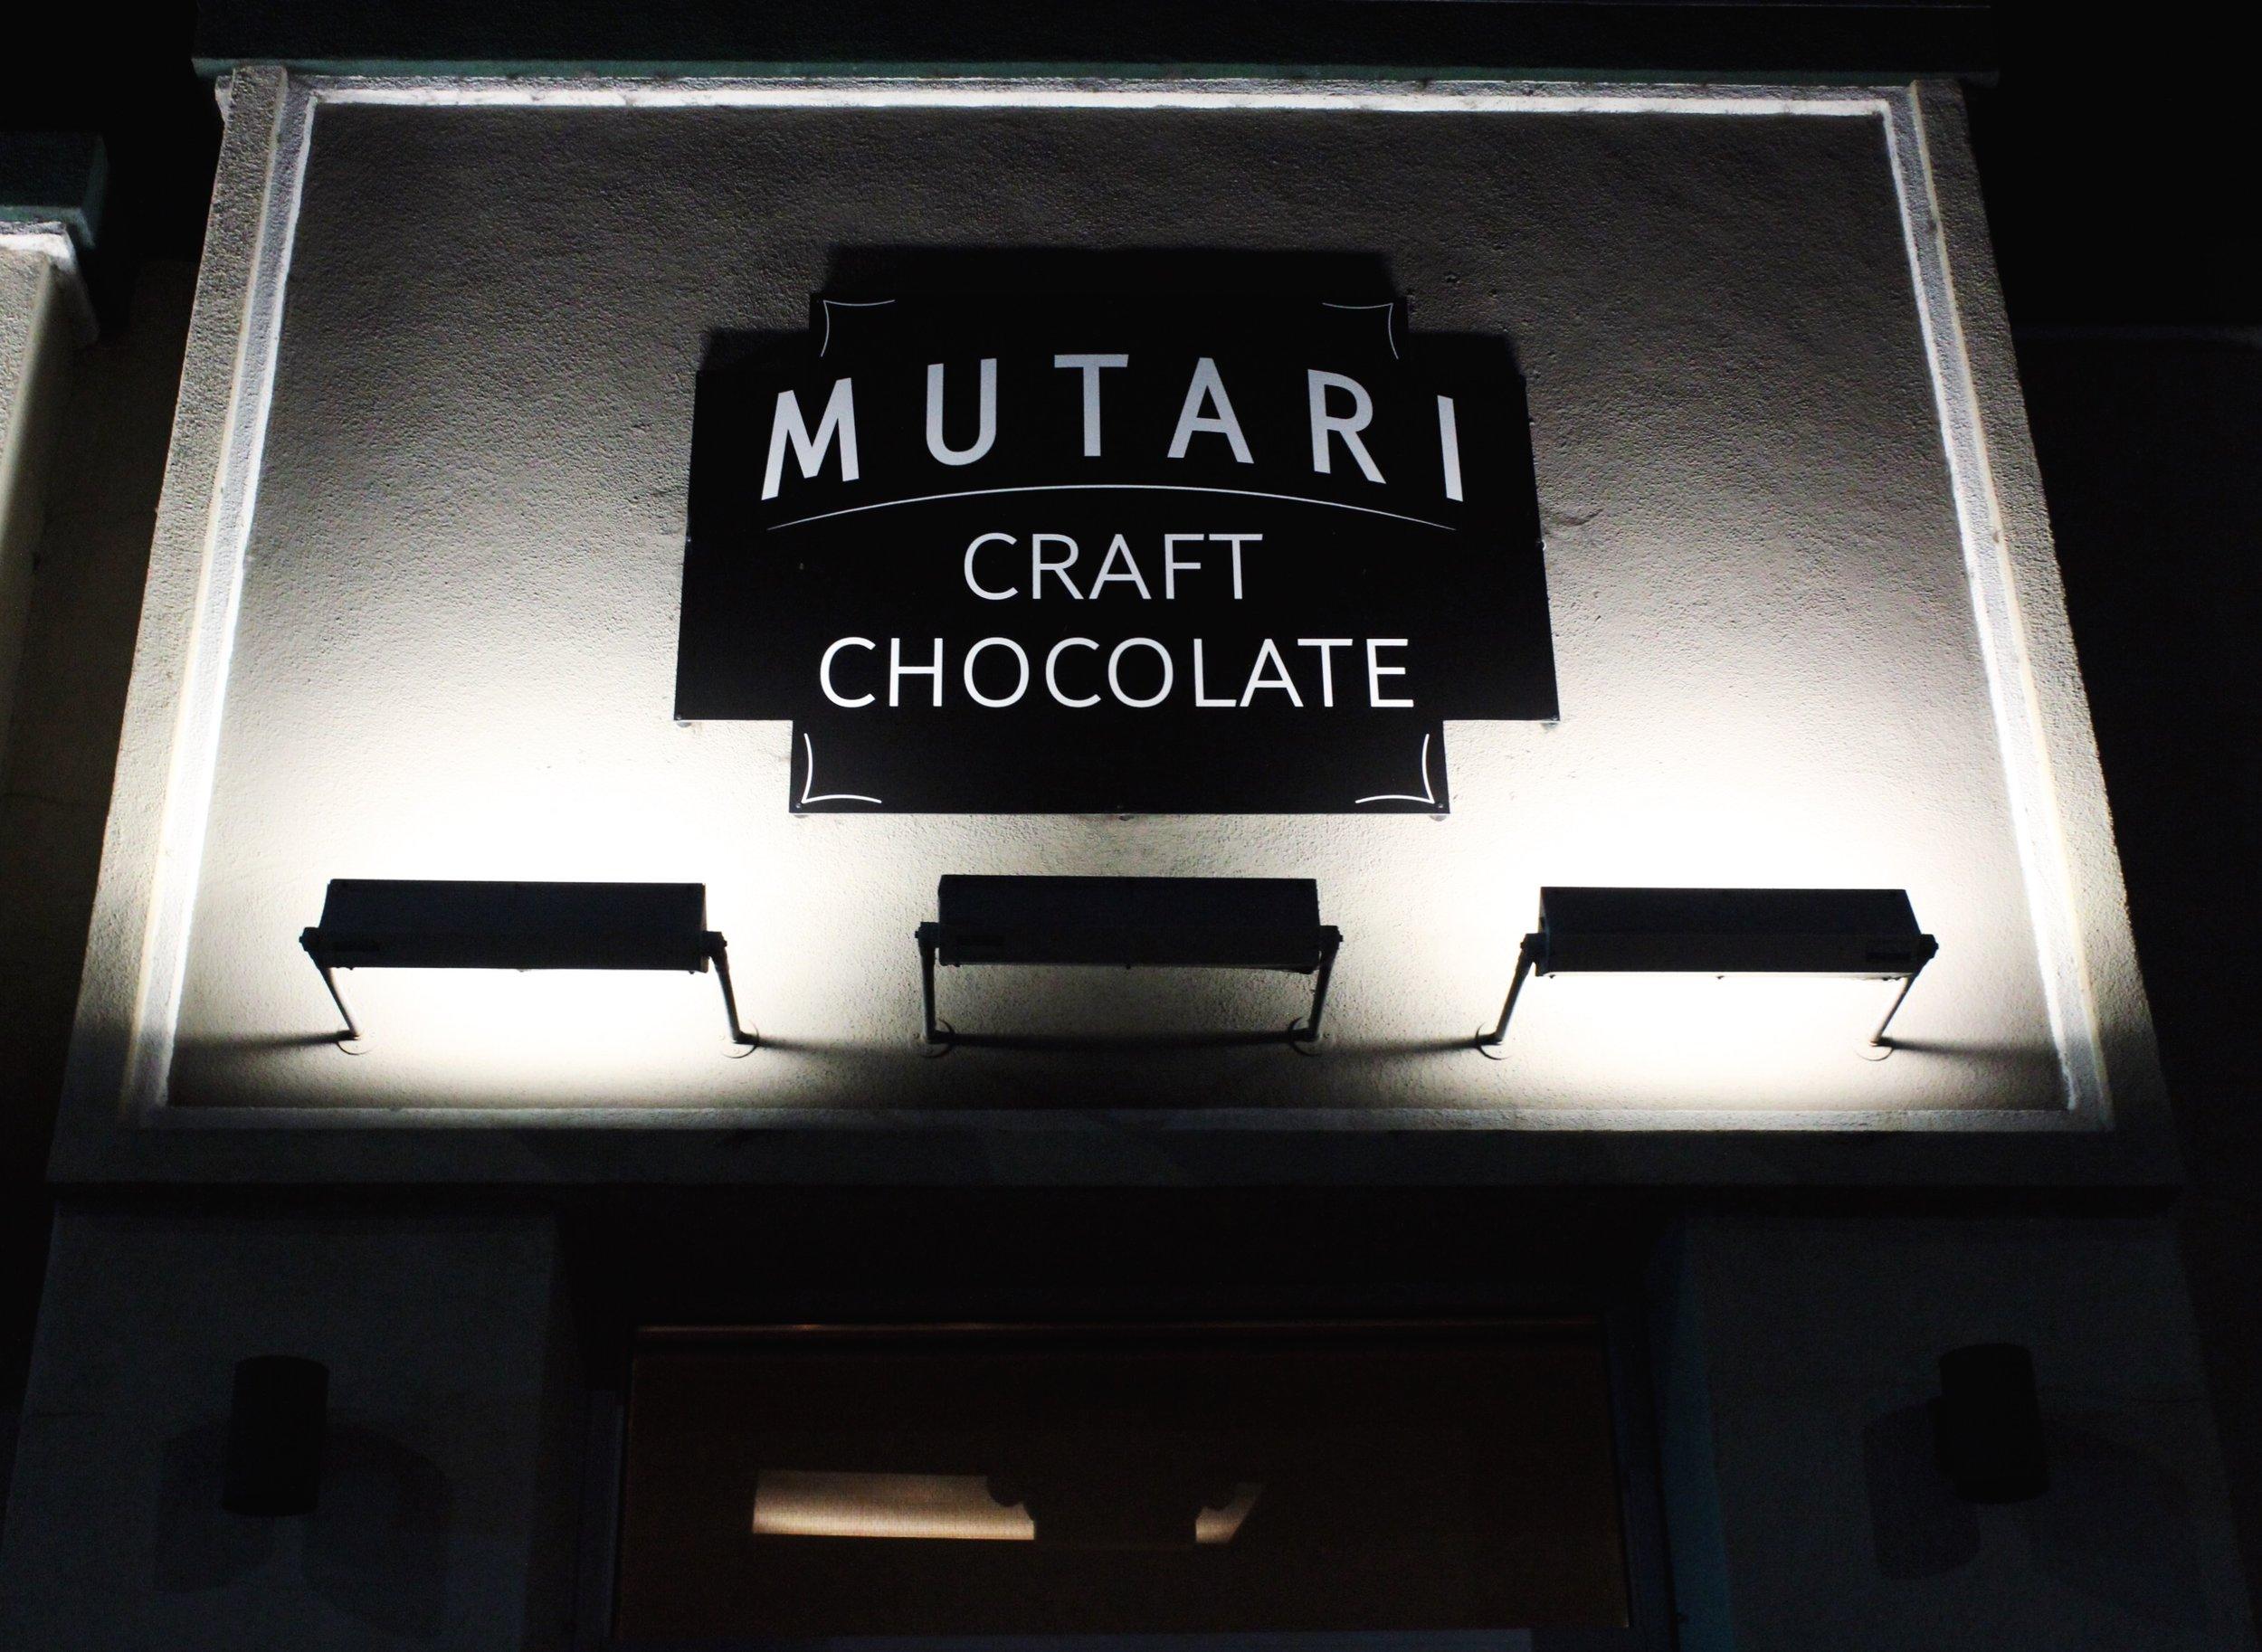 Mutari Craft Chocolate in Santa Cruz, California